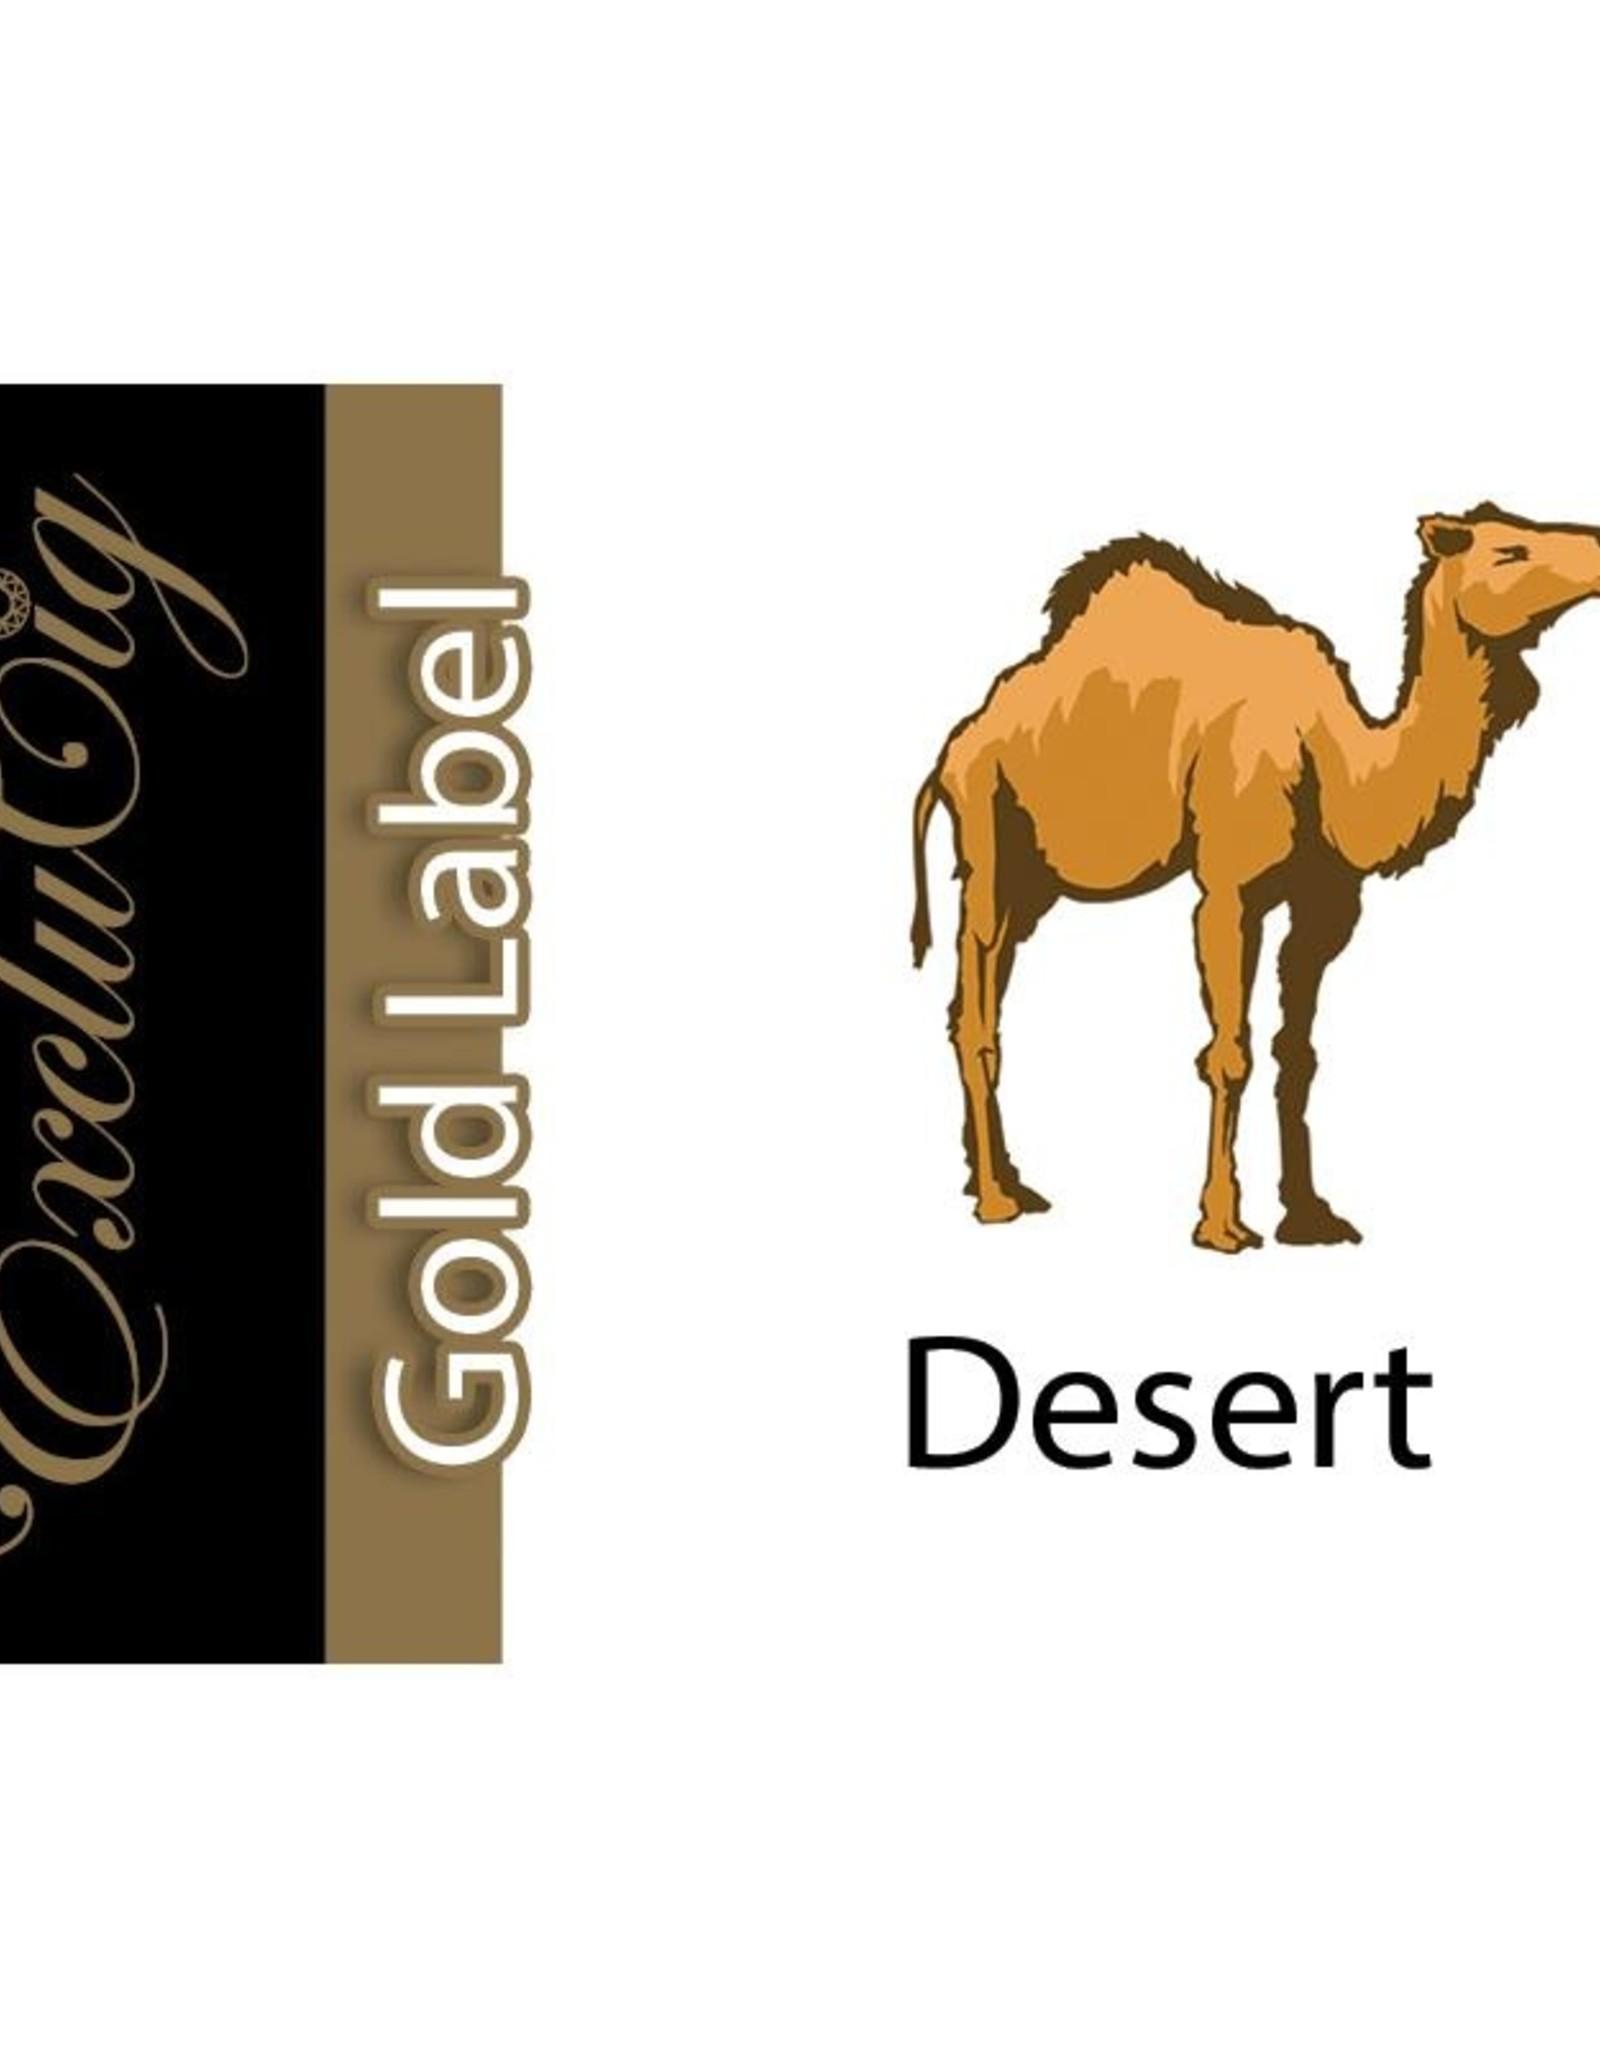 Exclucig Exclucig Gold Label E-liquid Desert 12 mg Nicotine